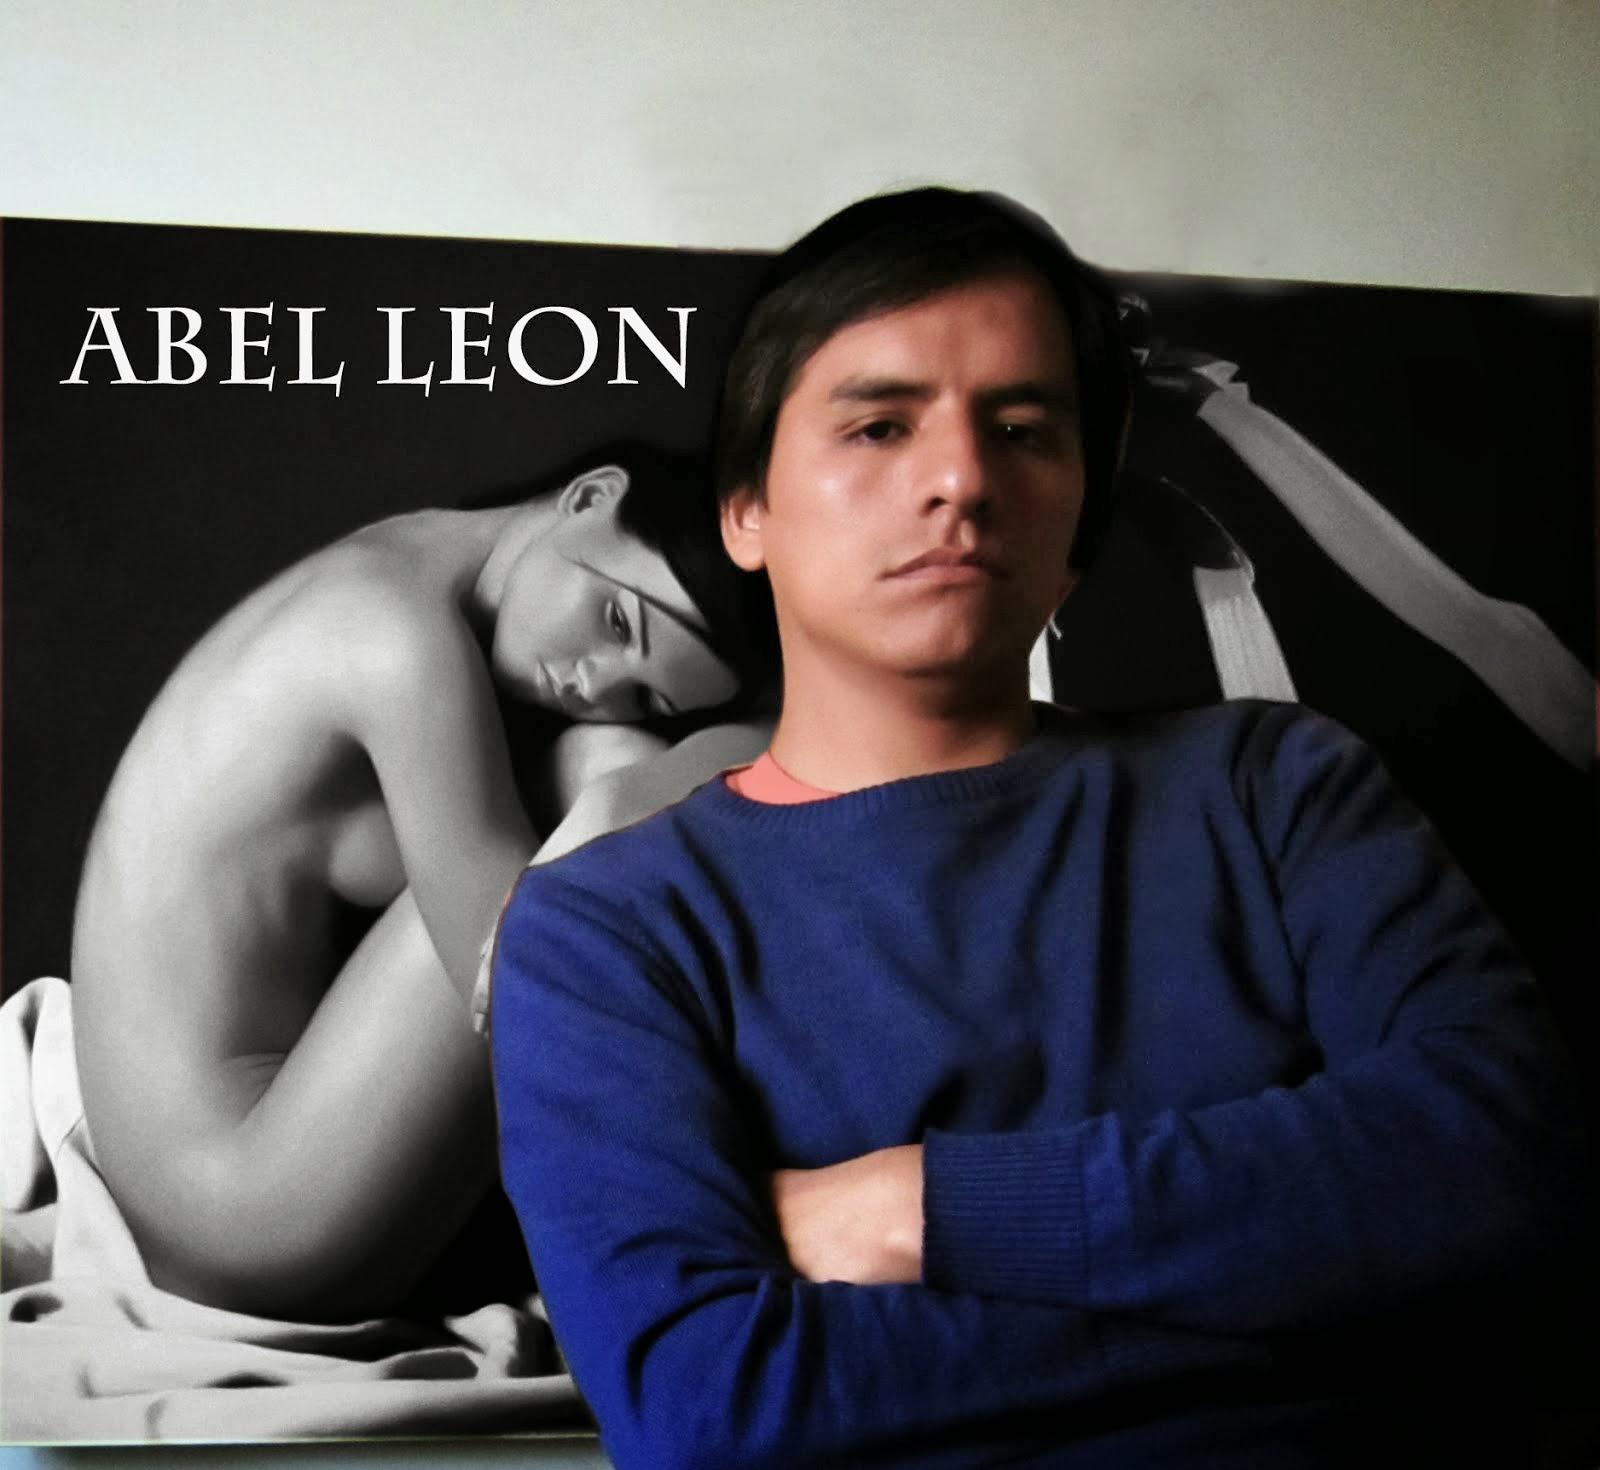 ABEL LEON YURIVILCA